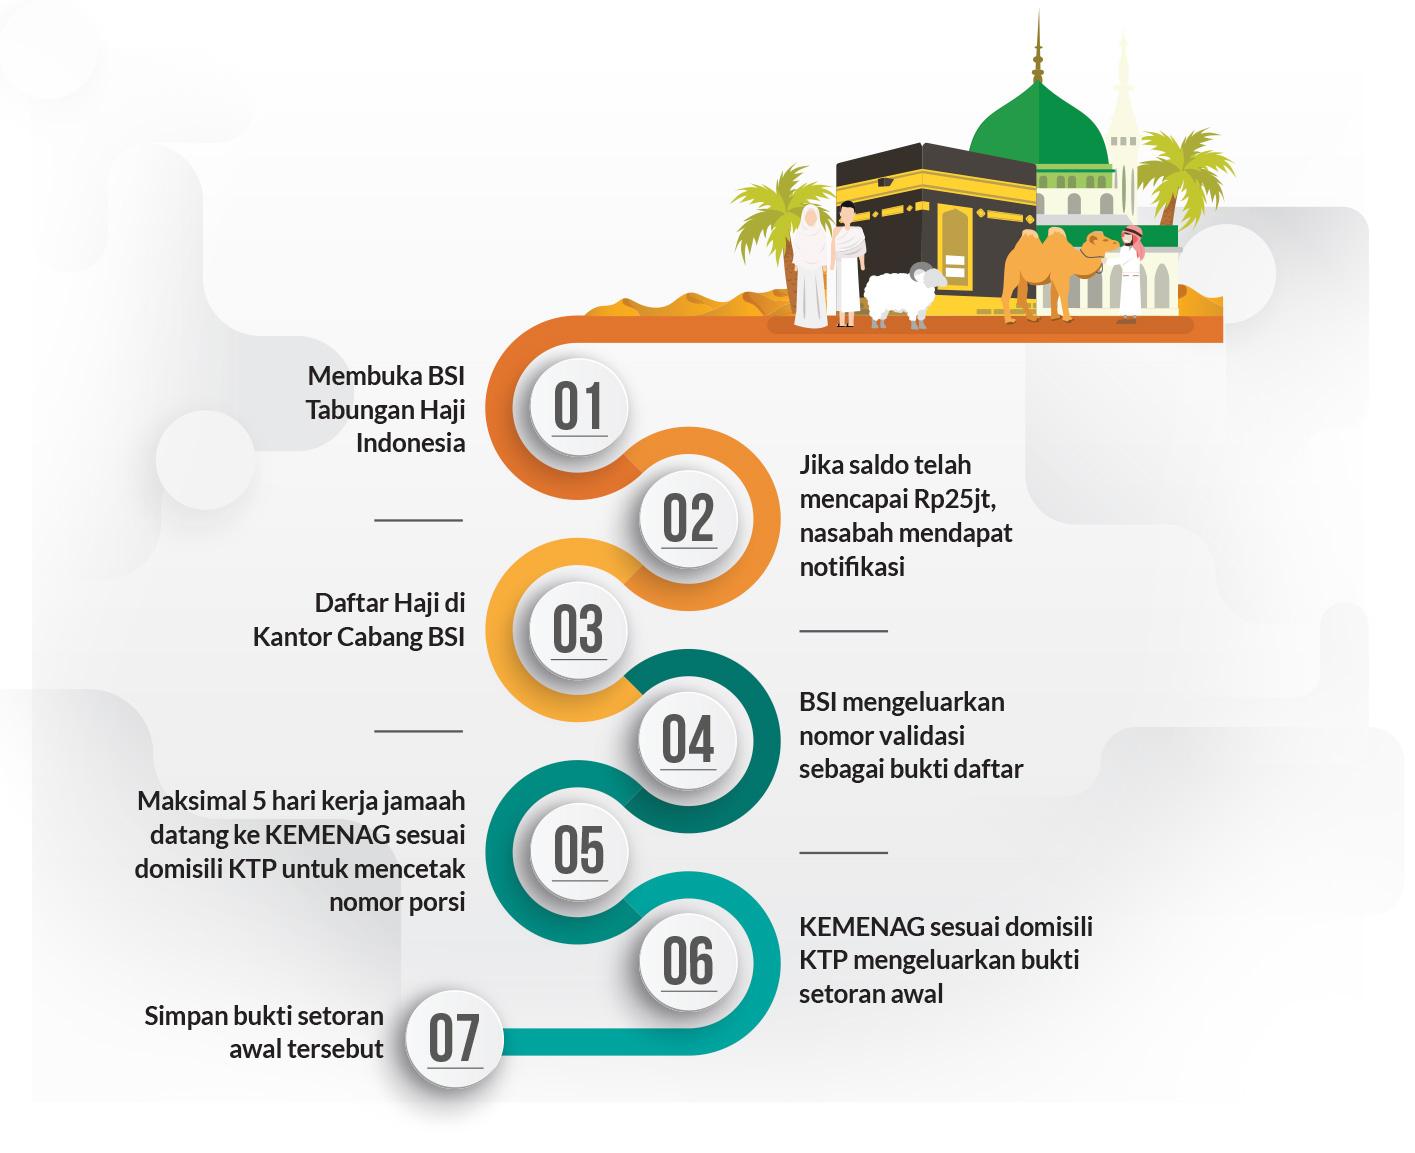 Tabungan Haji BSI